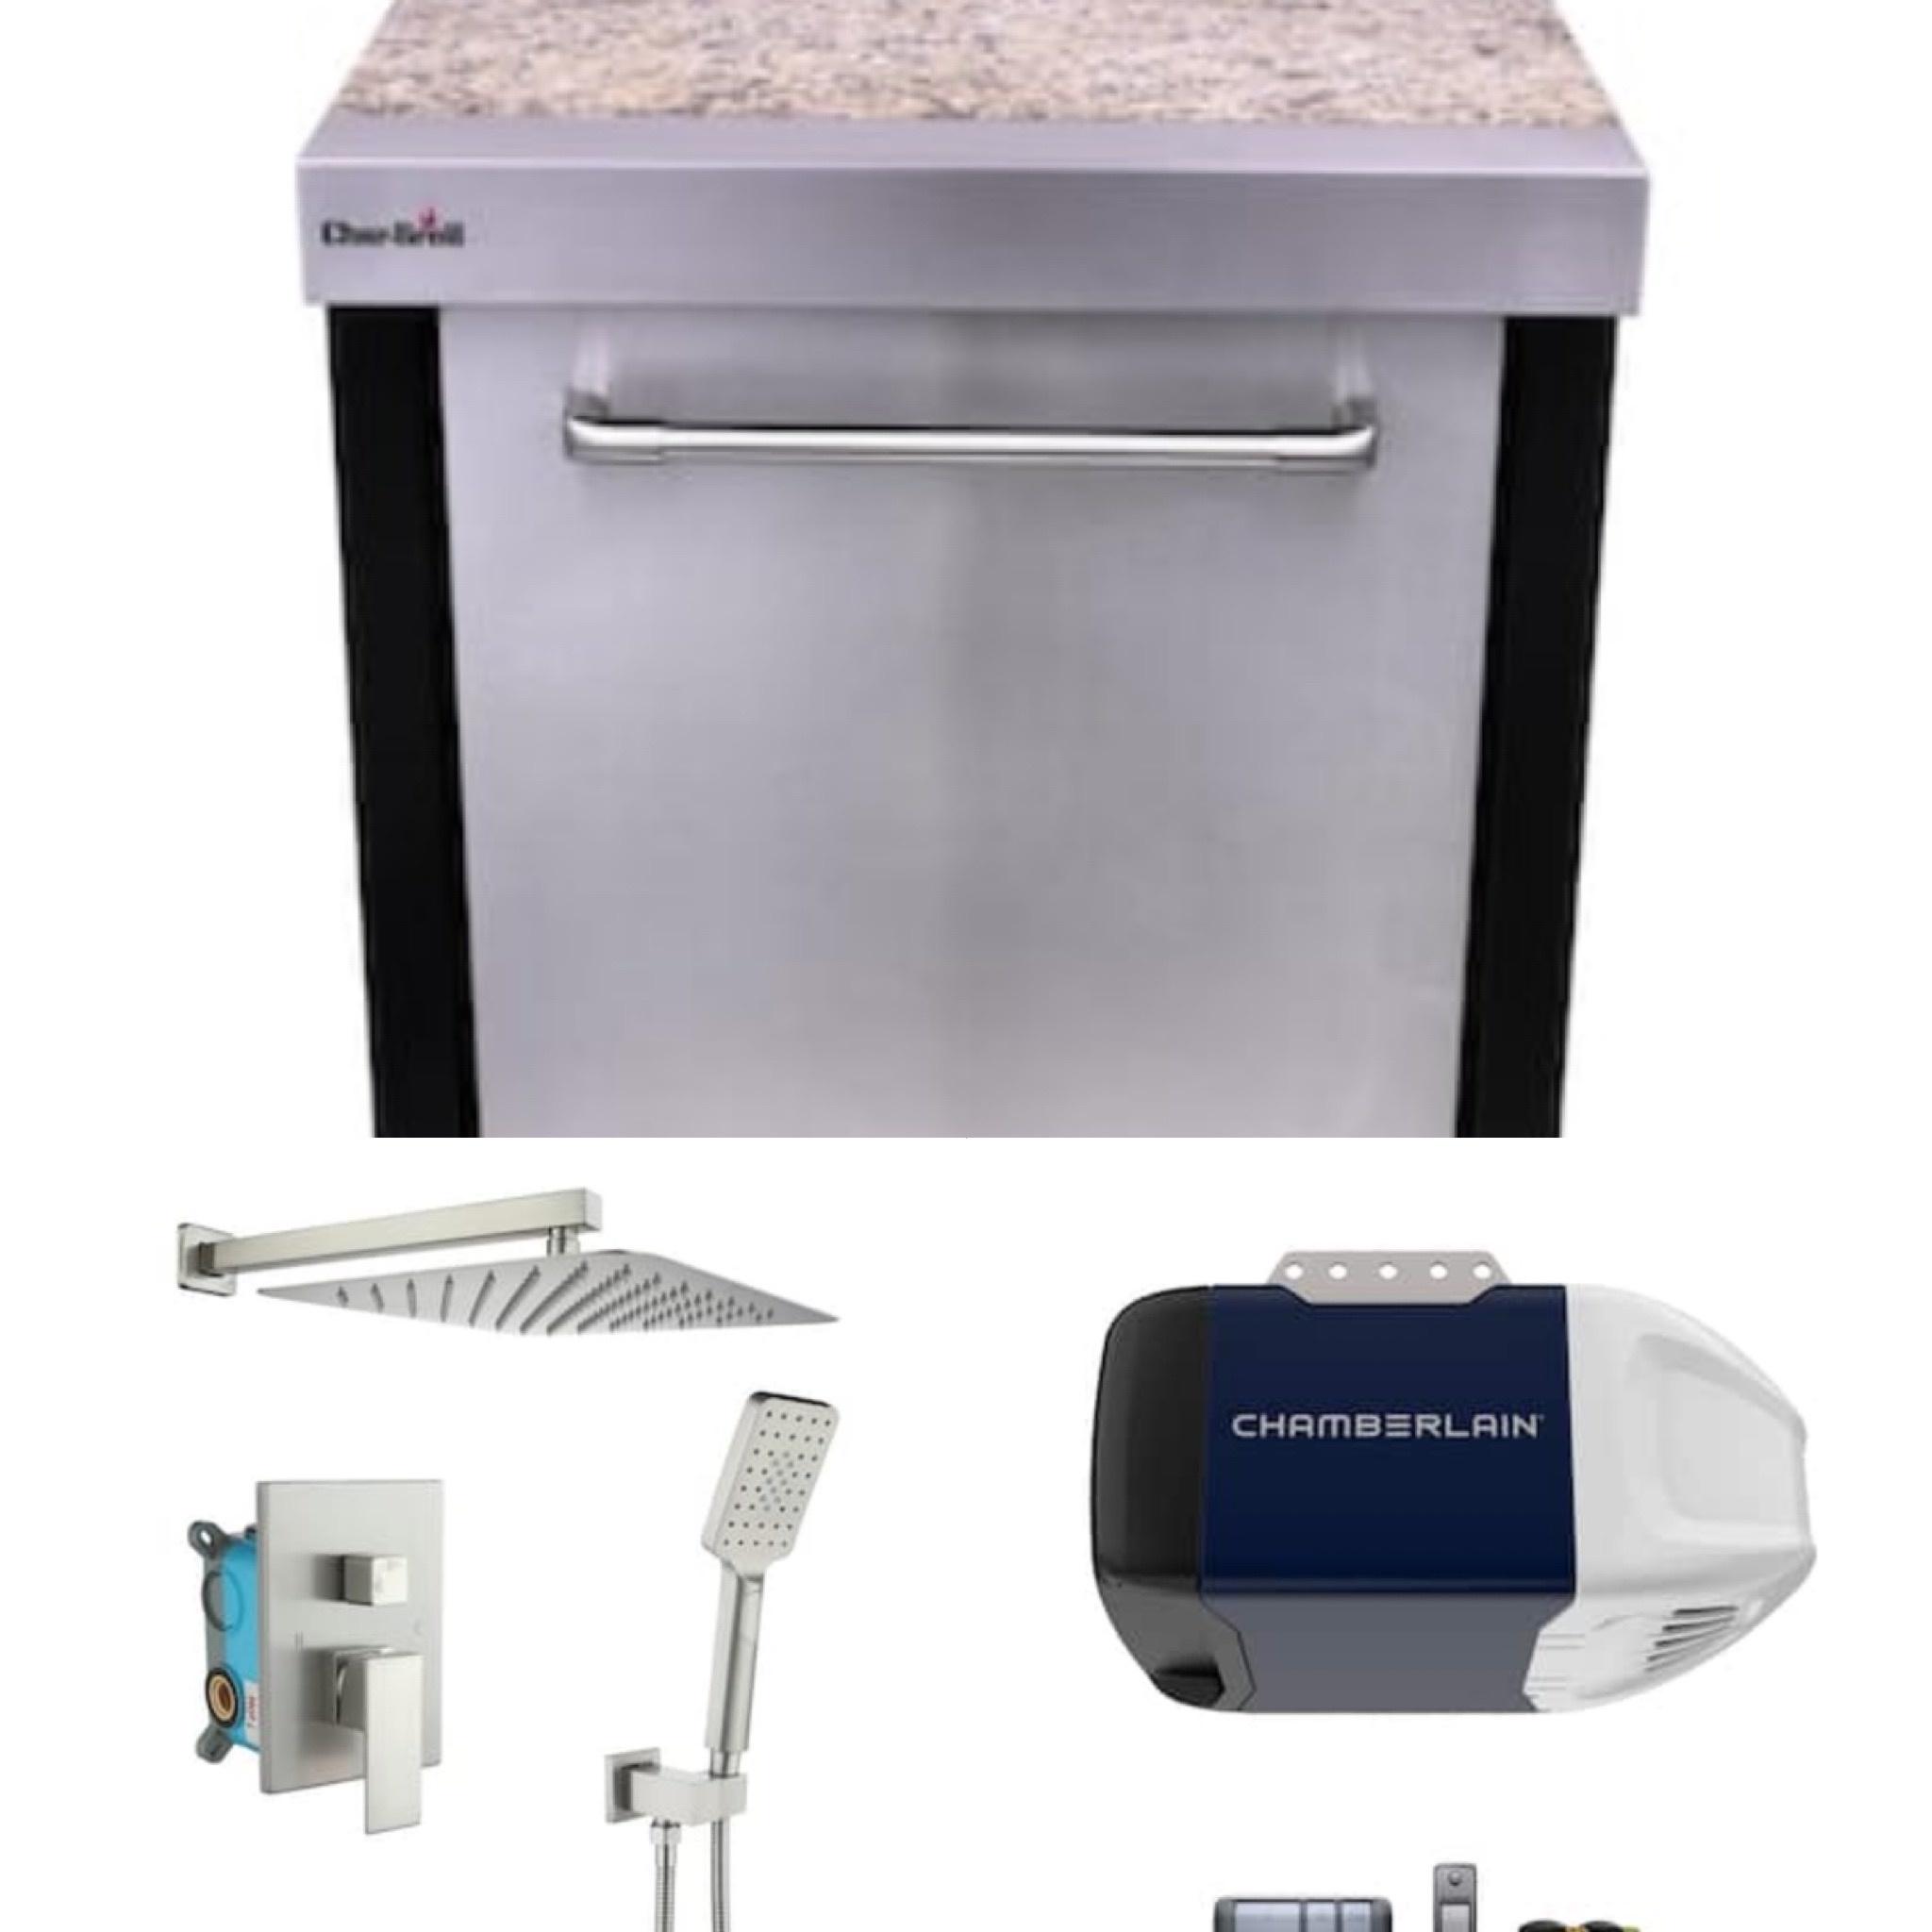 Outdoor refrigerator, shower bar system, Chamberlain garage door opener, and more!